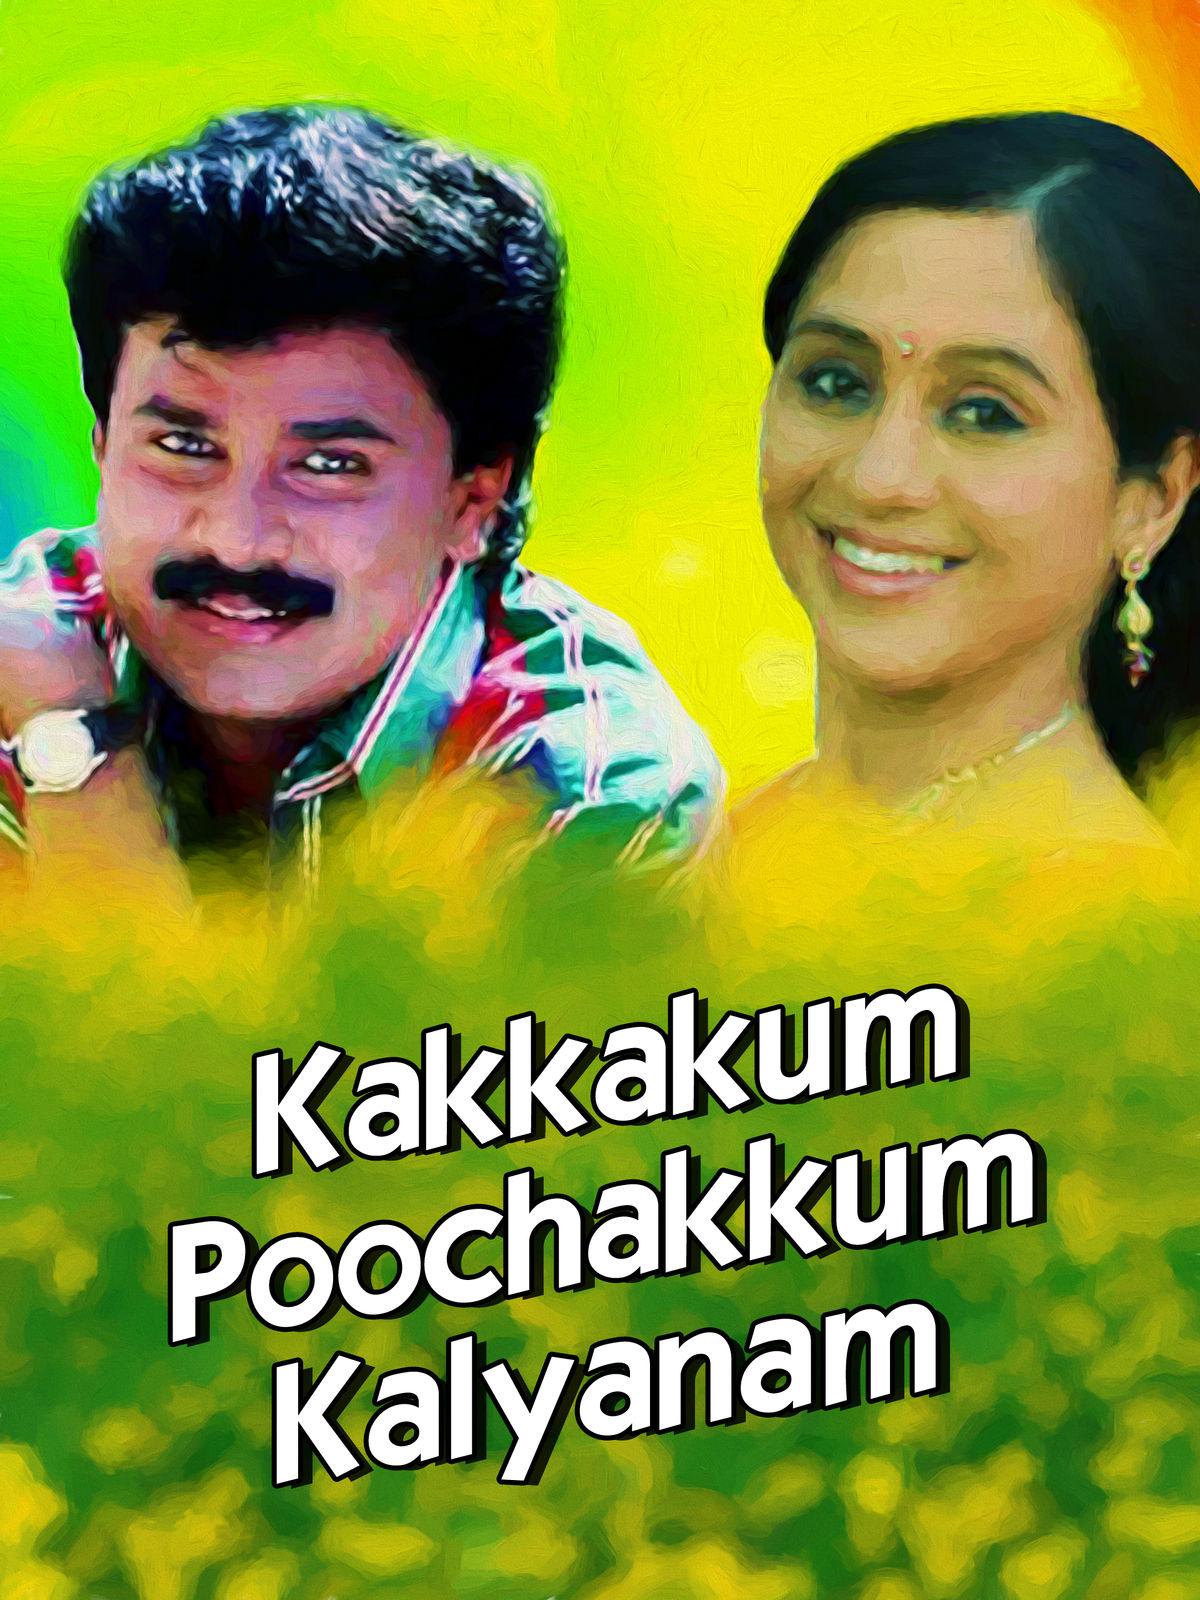 Kakkakum Poochakkum Kalyanam